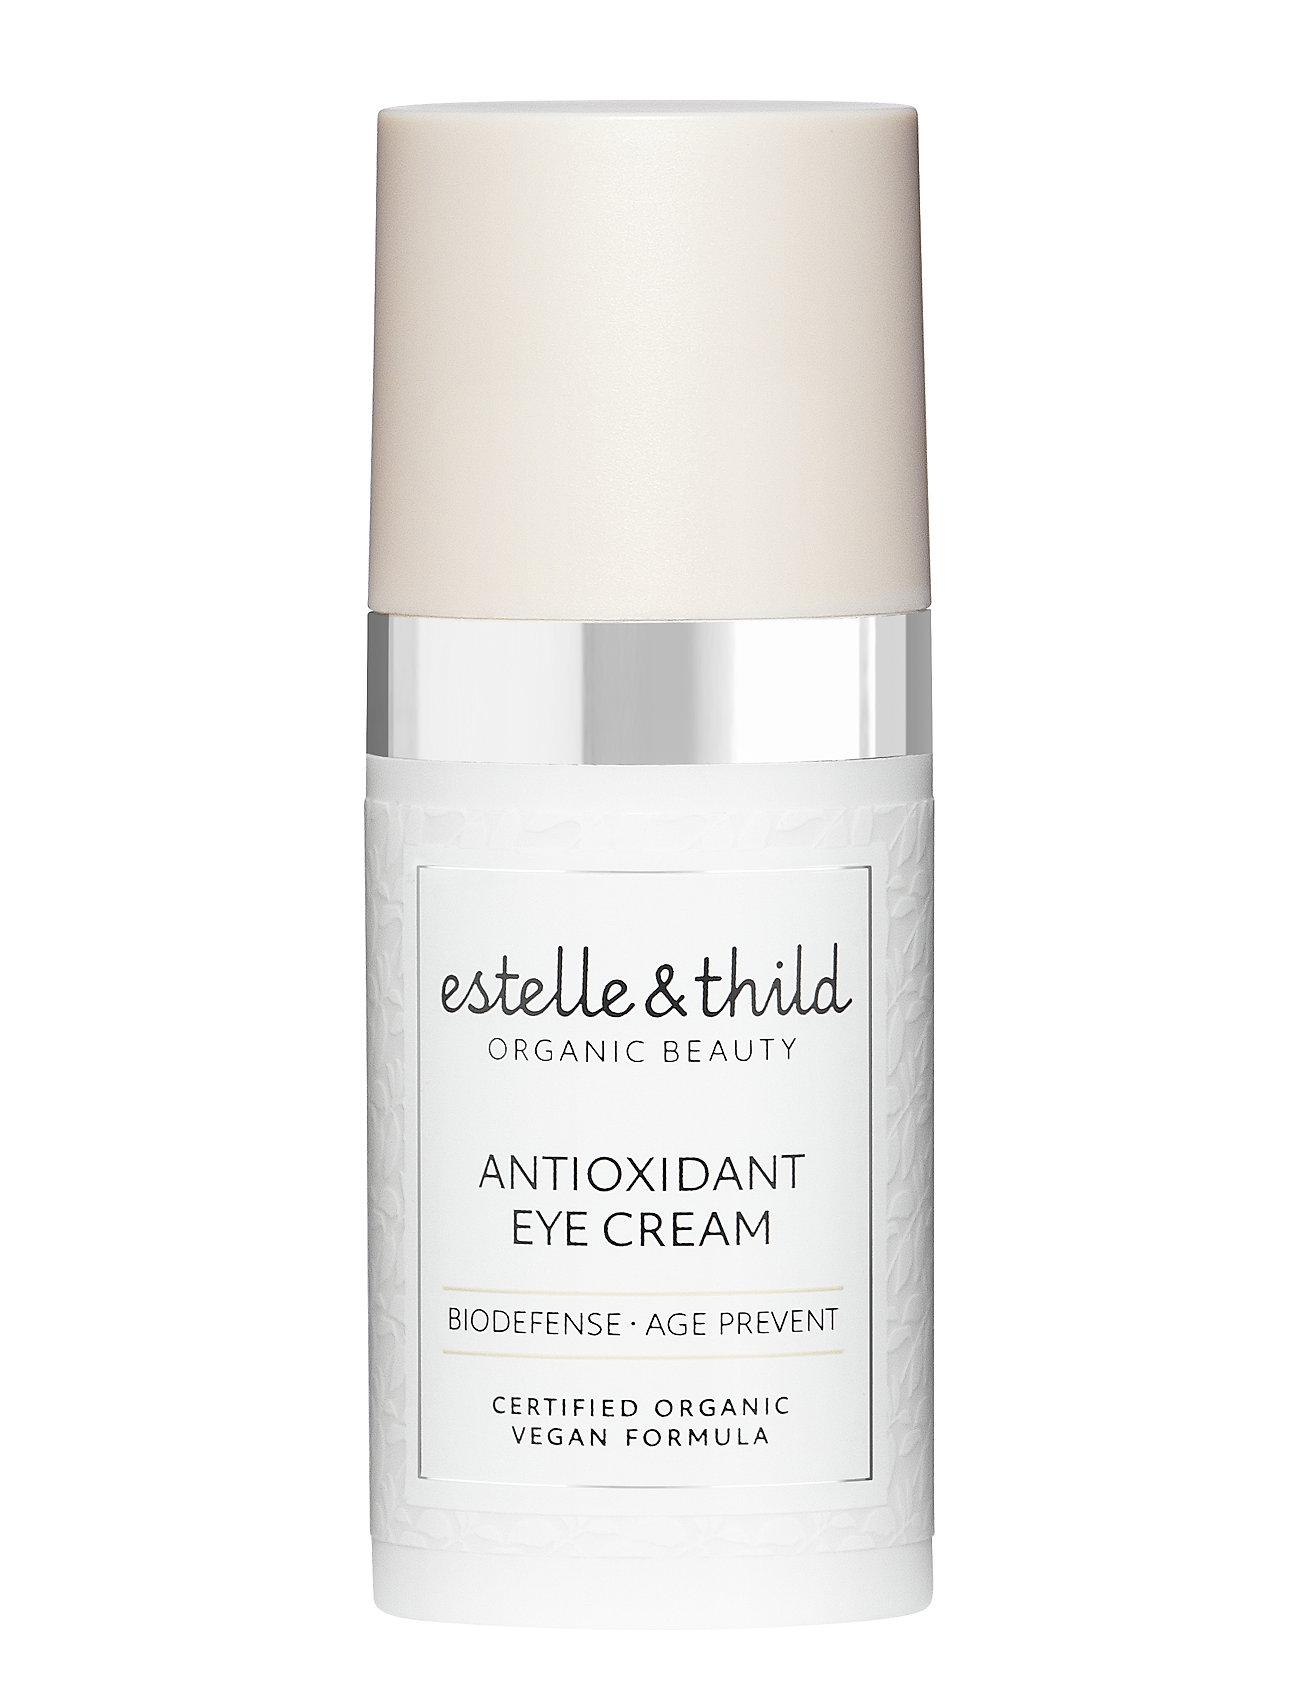 Biodefense Antioxidant Eye Cream - Estelle & Thild